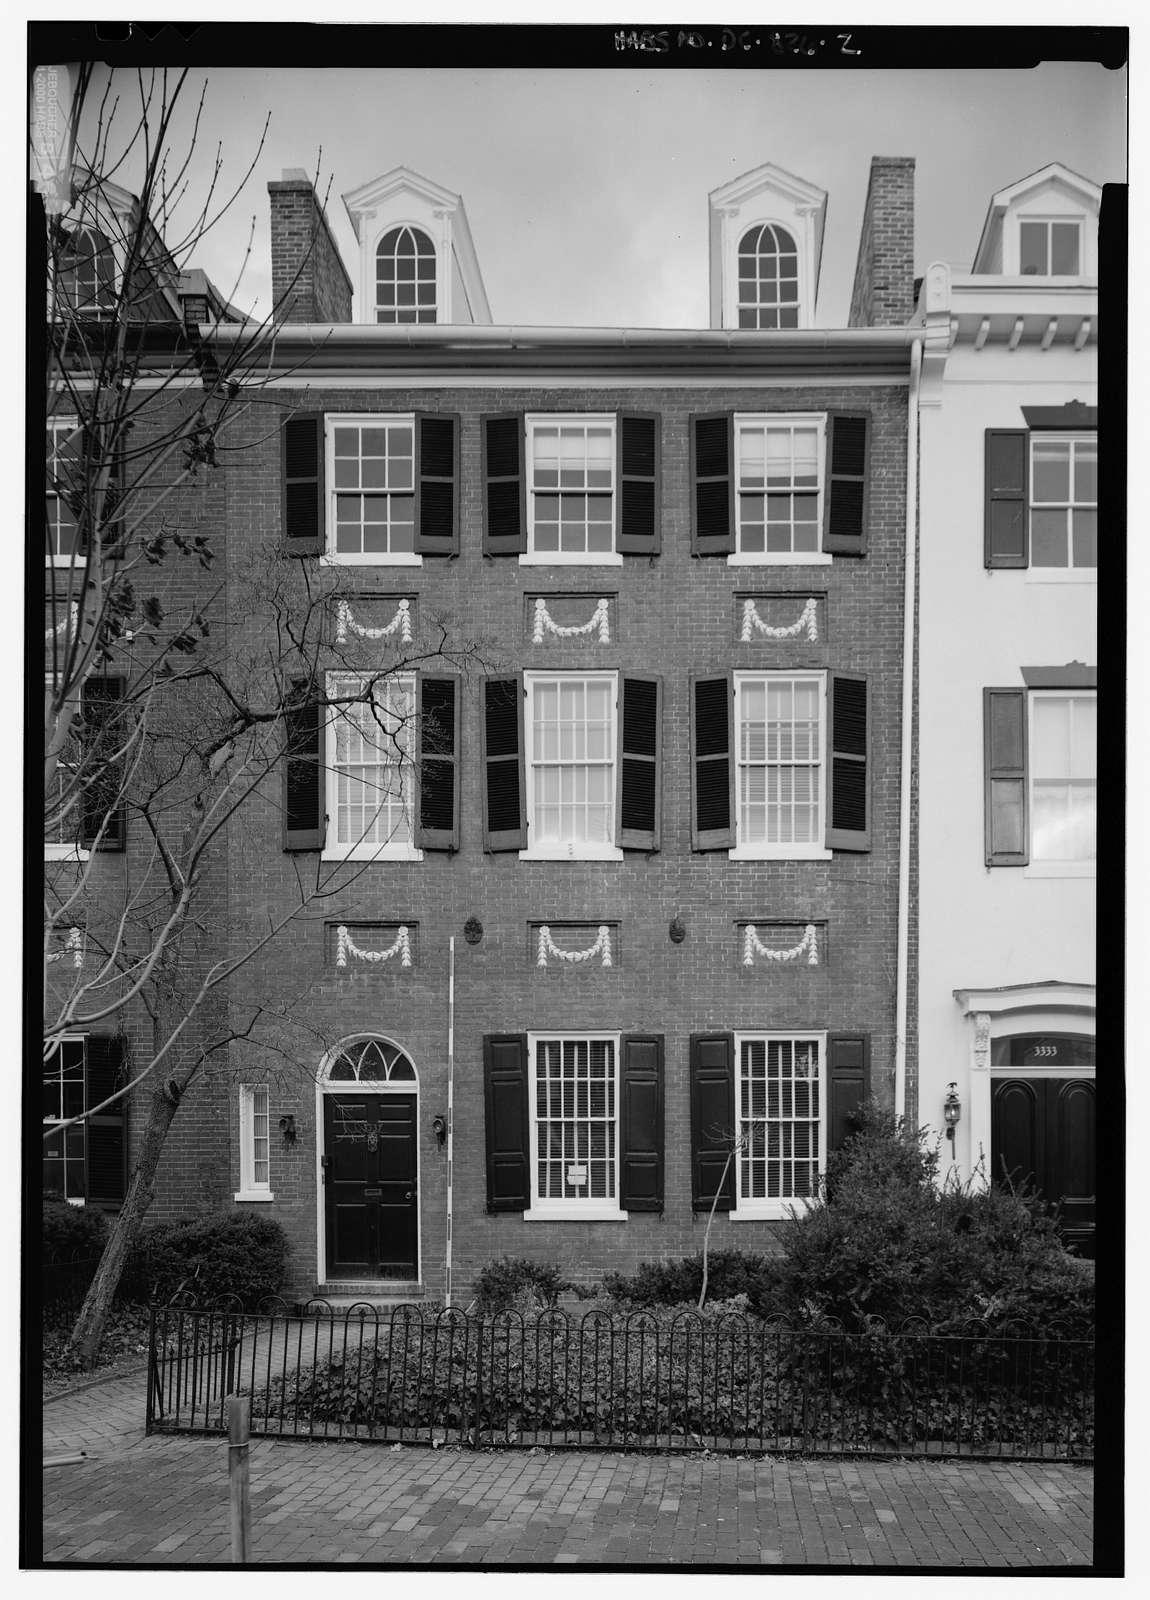 3337 N Street, Northwest (House), Washington, District of Columbia, DC